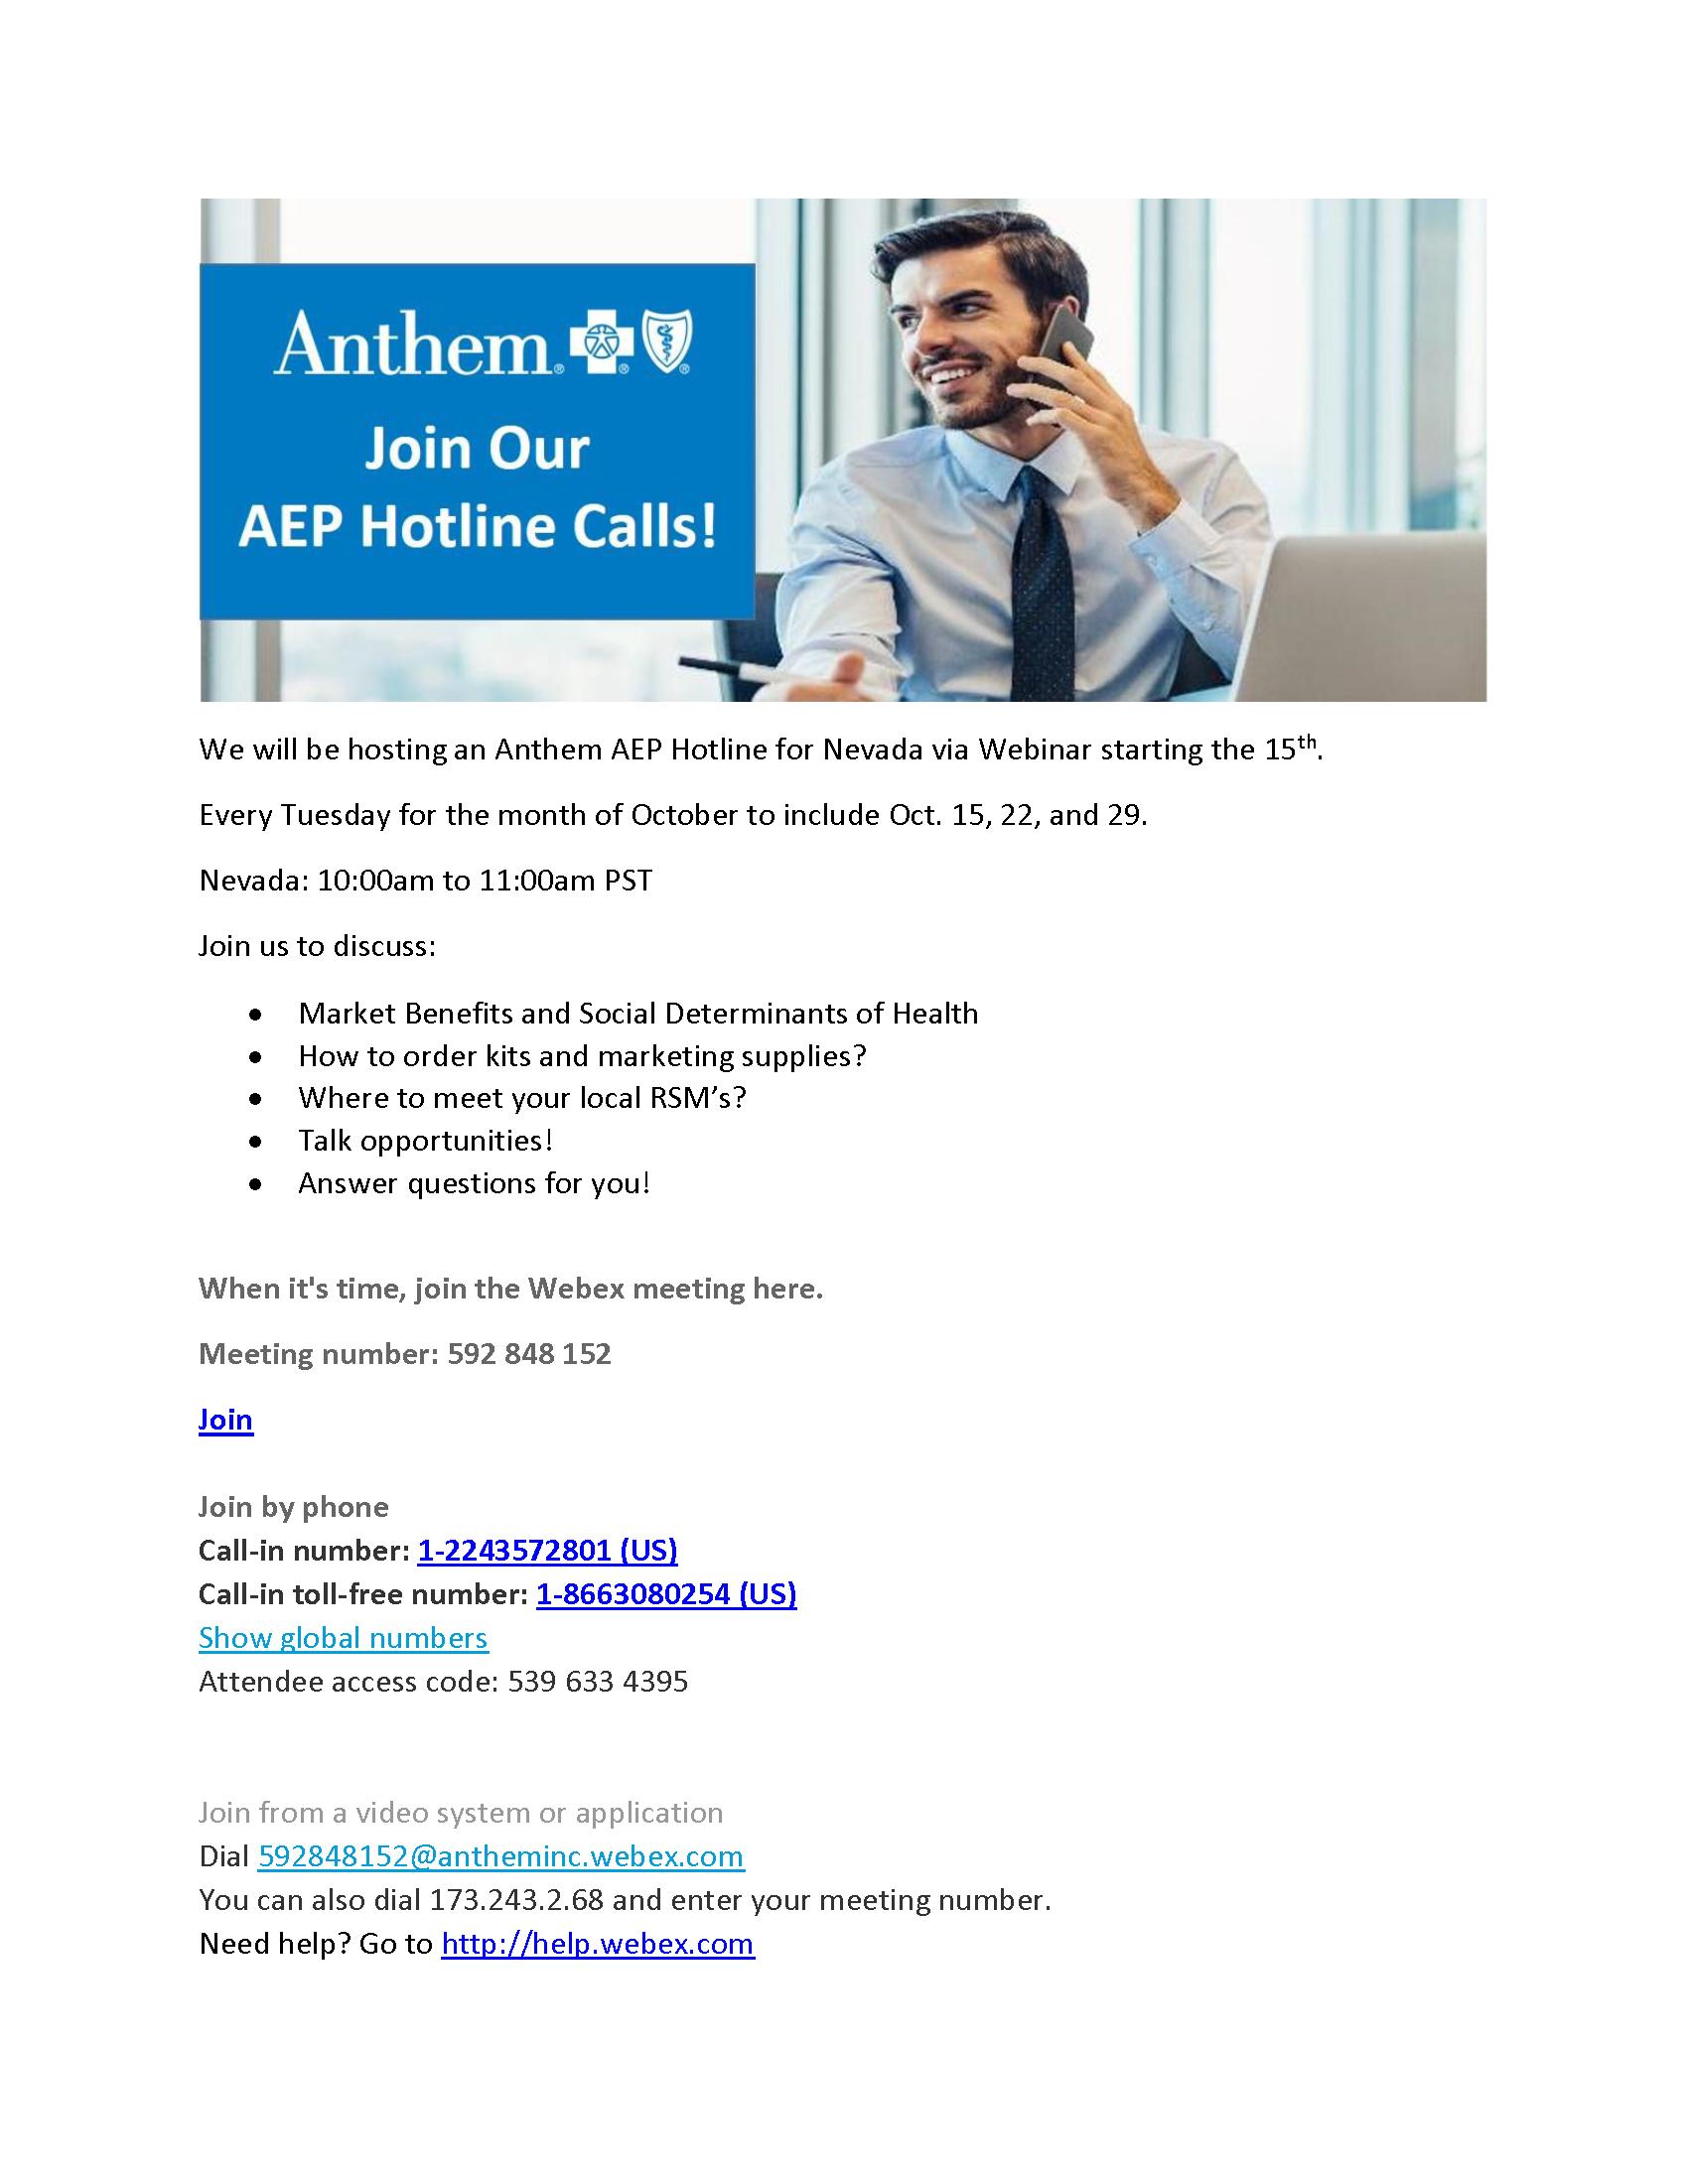 NV Anthem BCBS AEP Hotline Webinar Invite.png